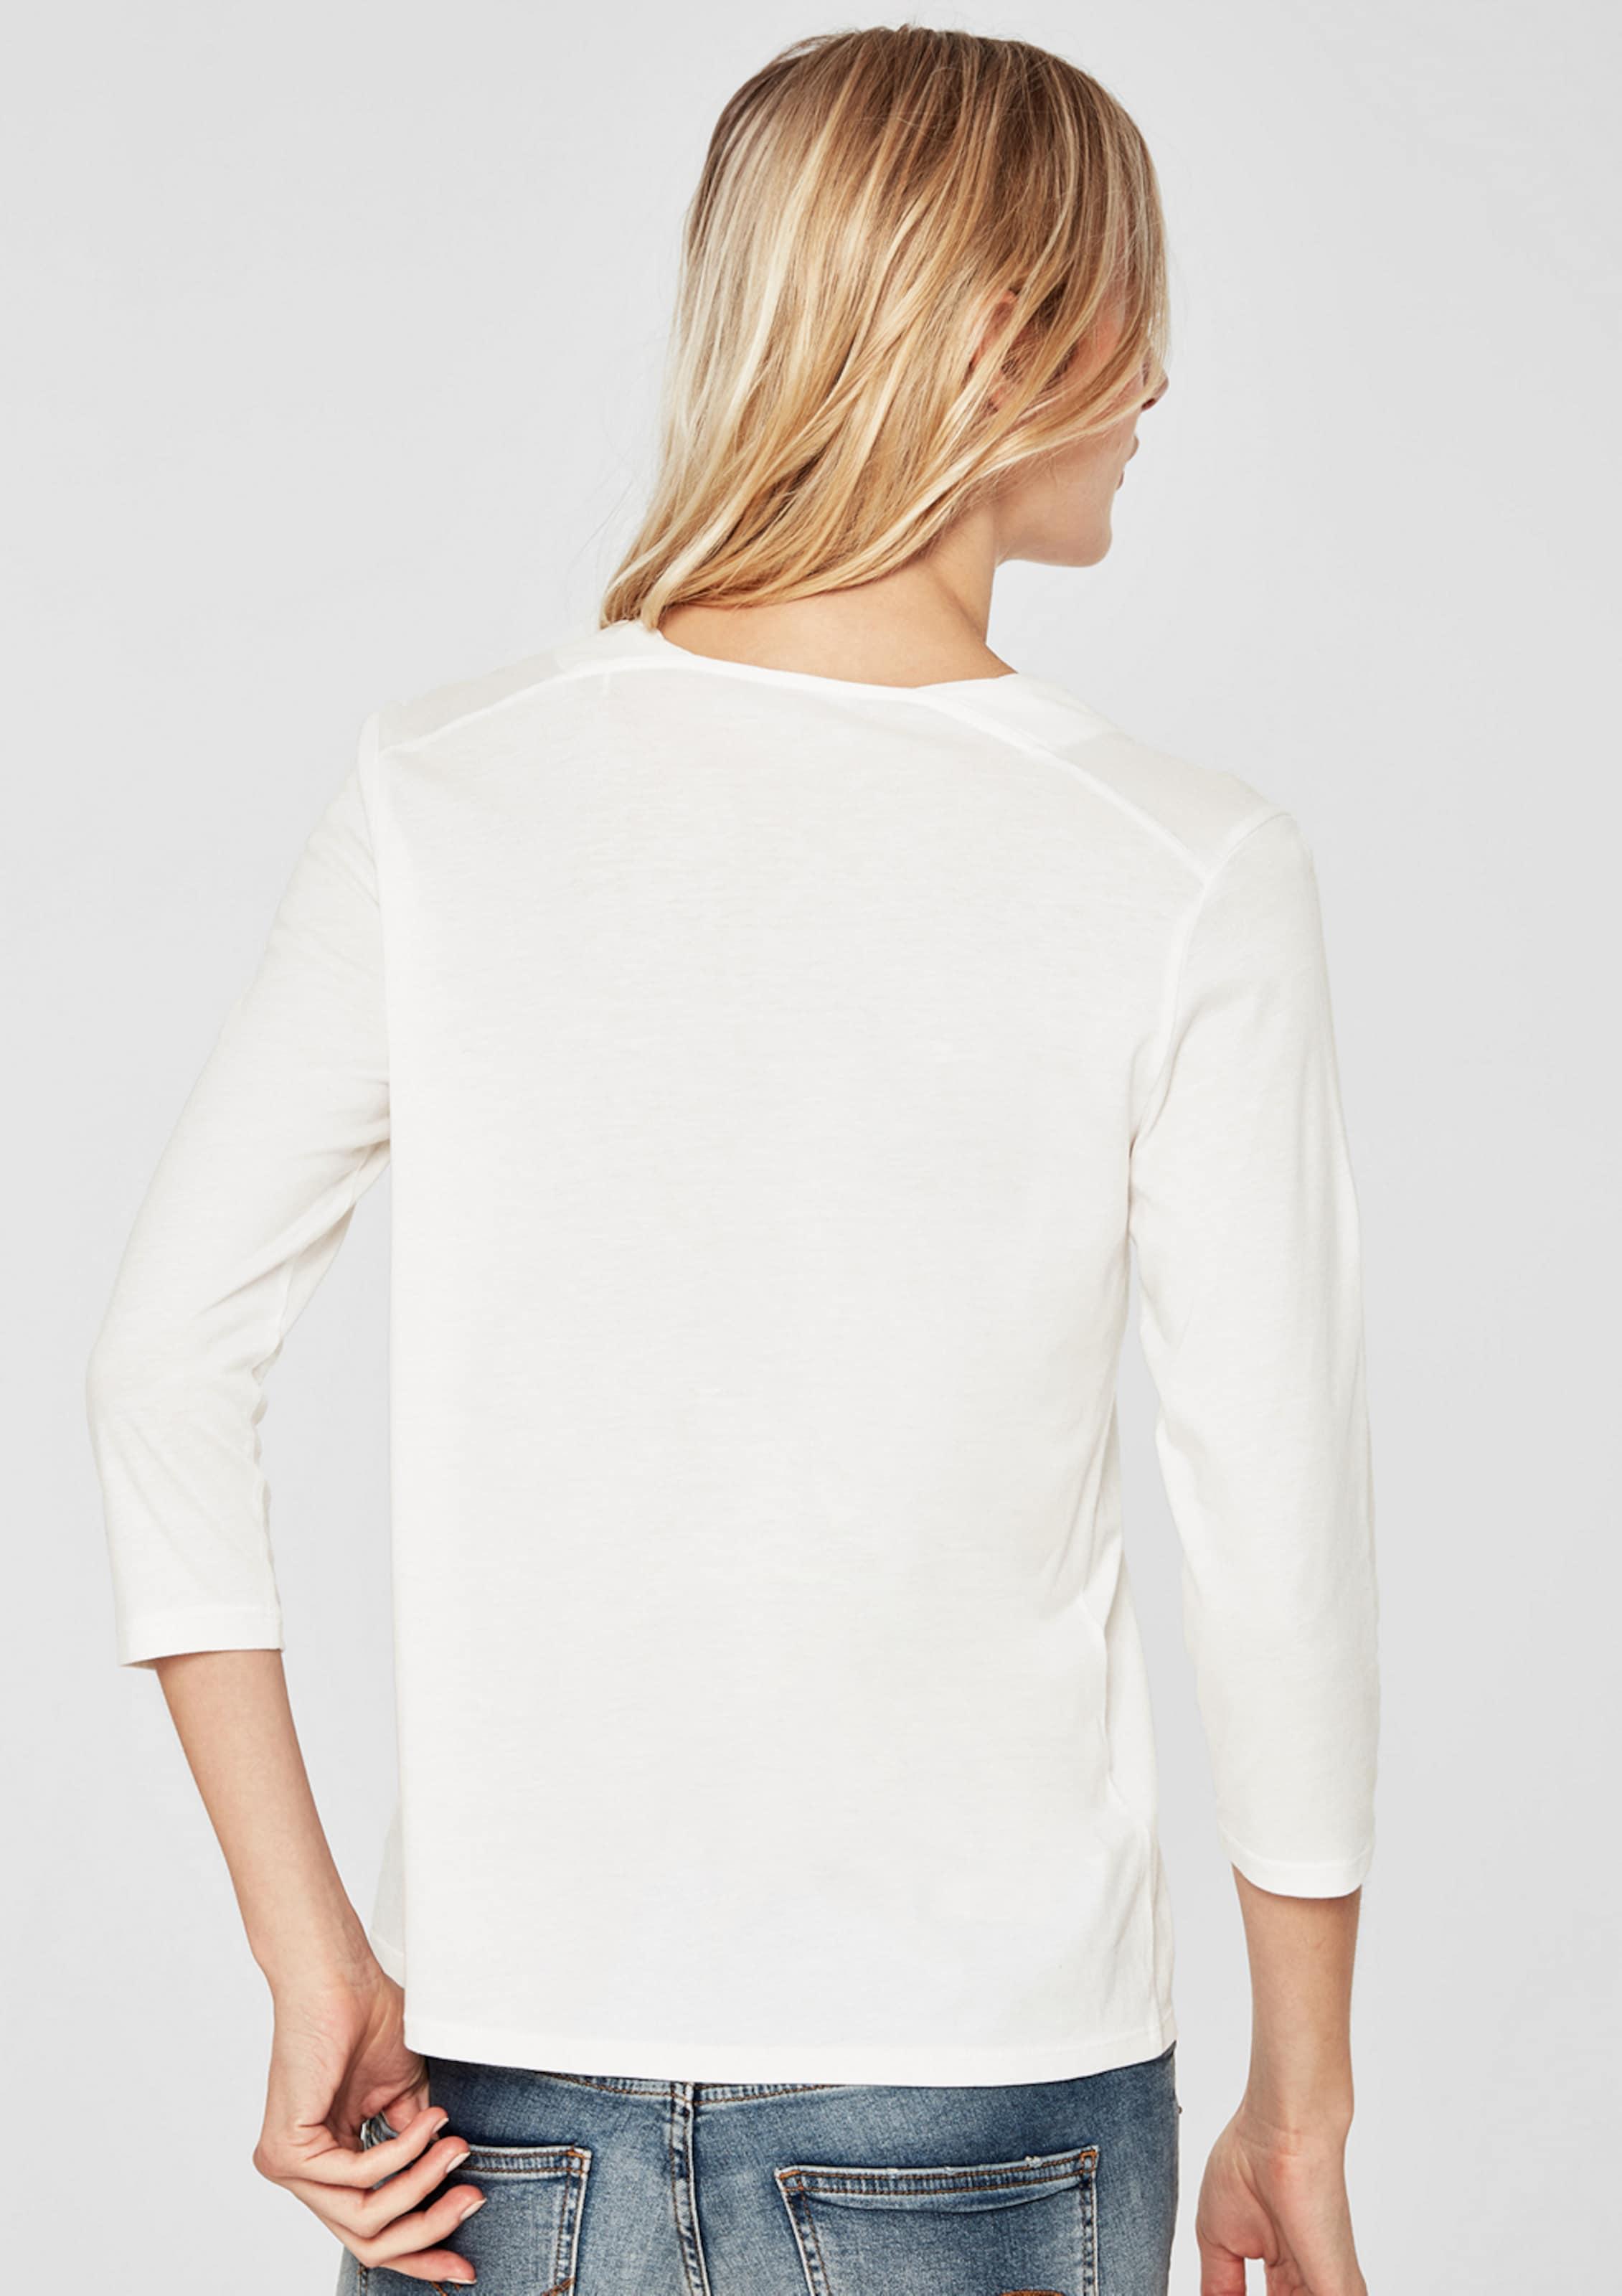 In Shirt S Red Weiß oliver Label TFl1cKJ